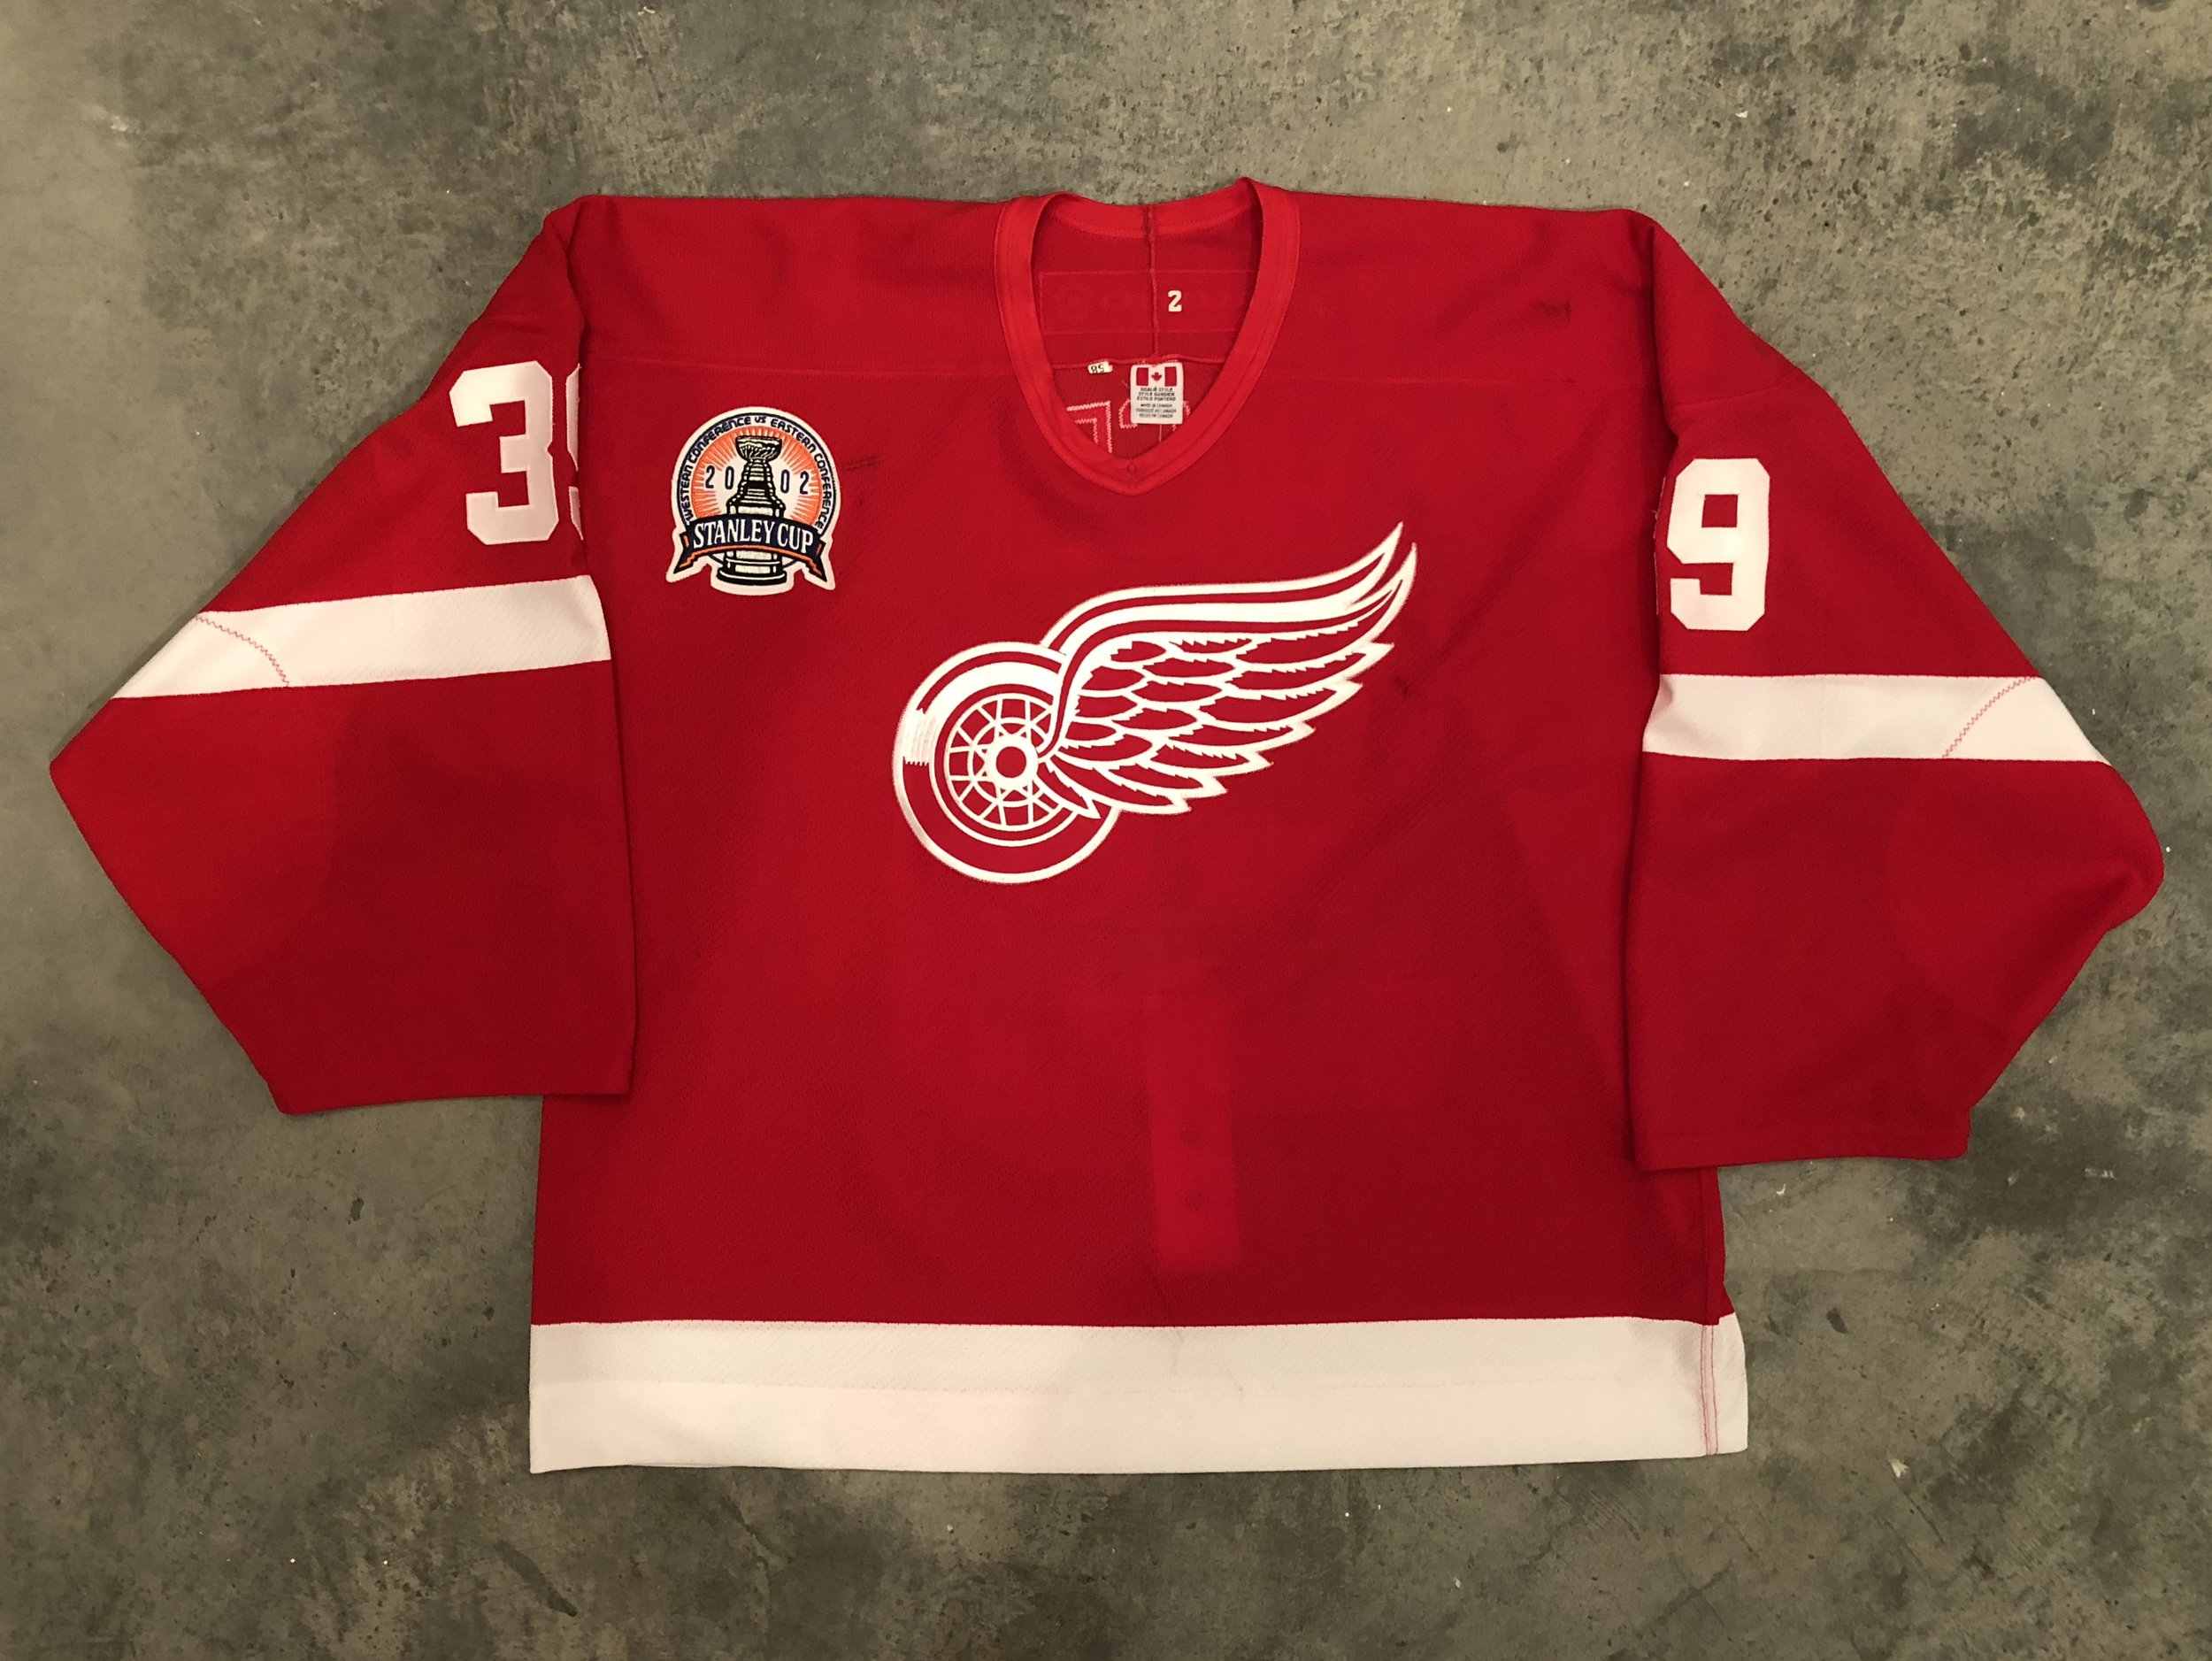 2002 Detroit Red Wings Stanley Cup Finals Game Worn Road Jersey - Dominik Hasek